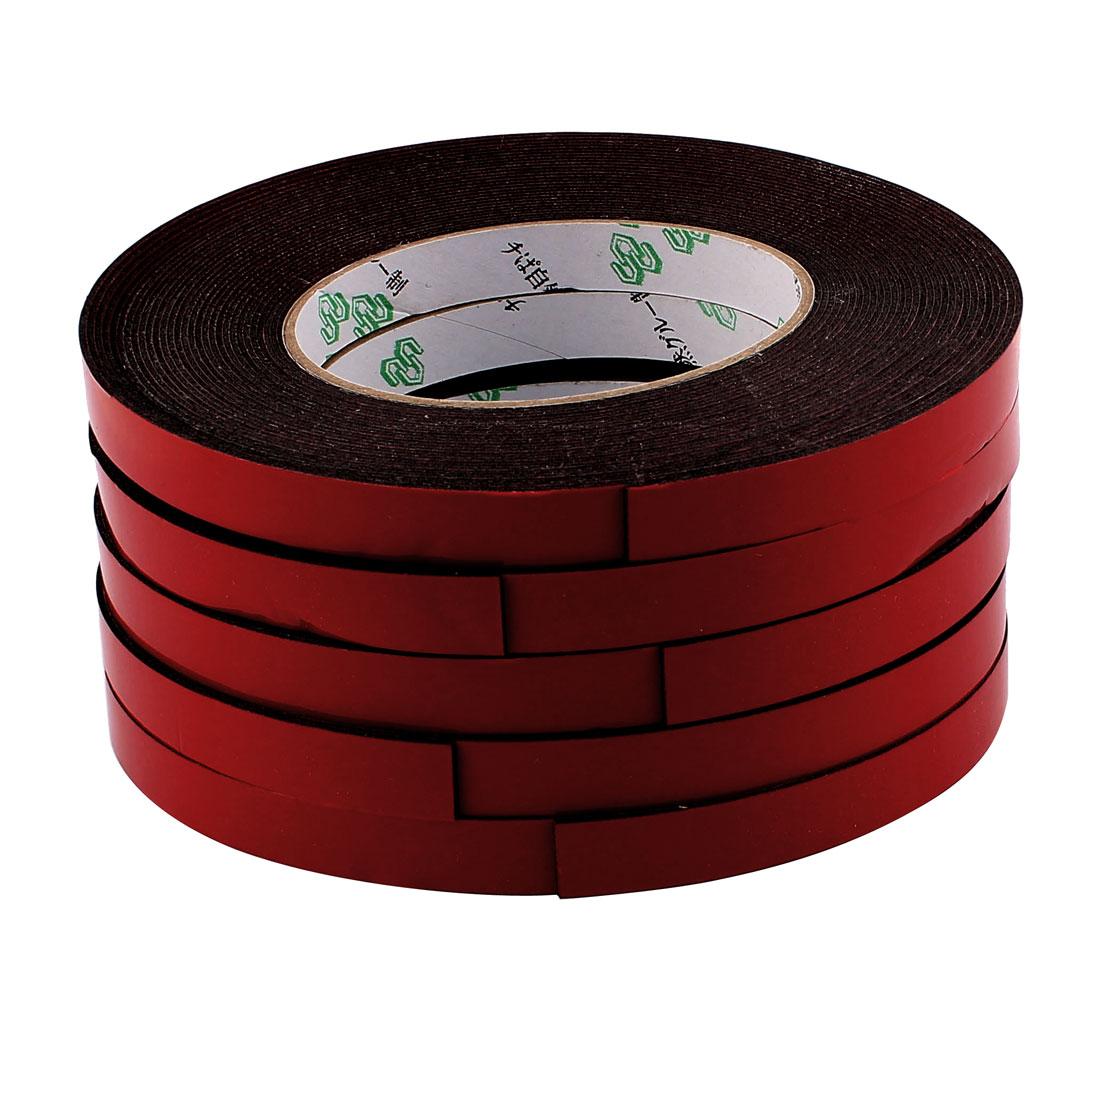 5 Pcs 1.2CM Width 10M Length 1MM Thick Dual Sided Sealing Shockproof Sponge Tape